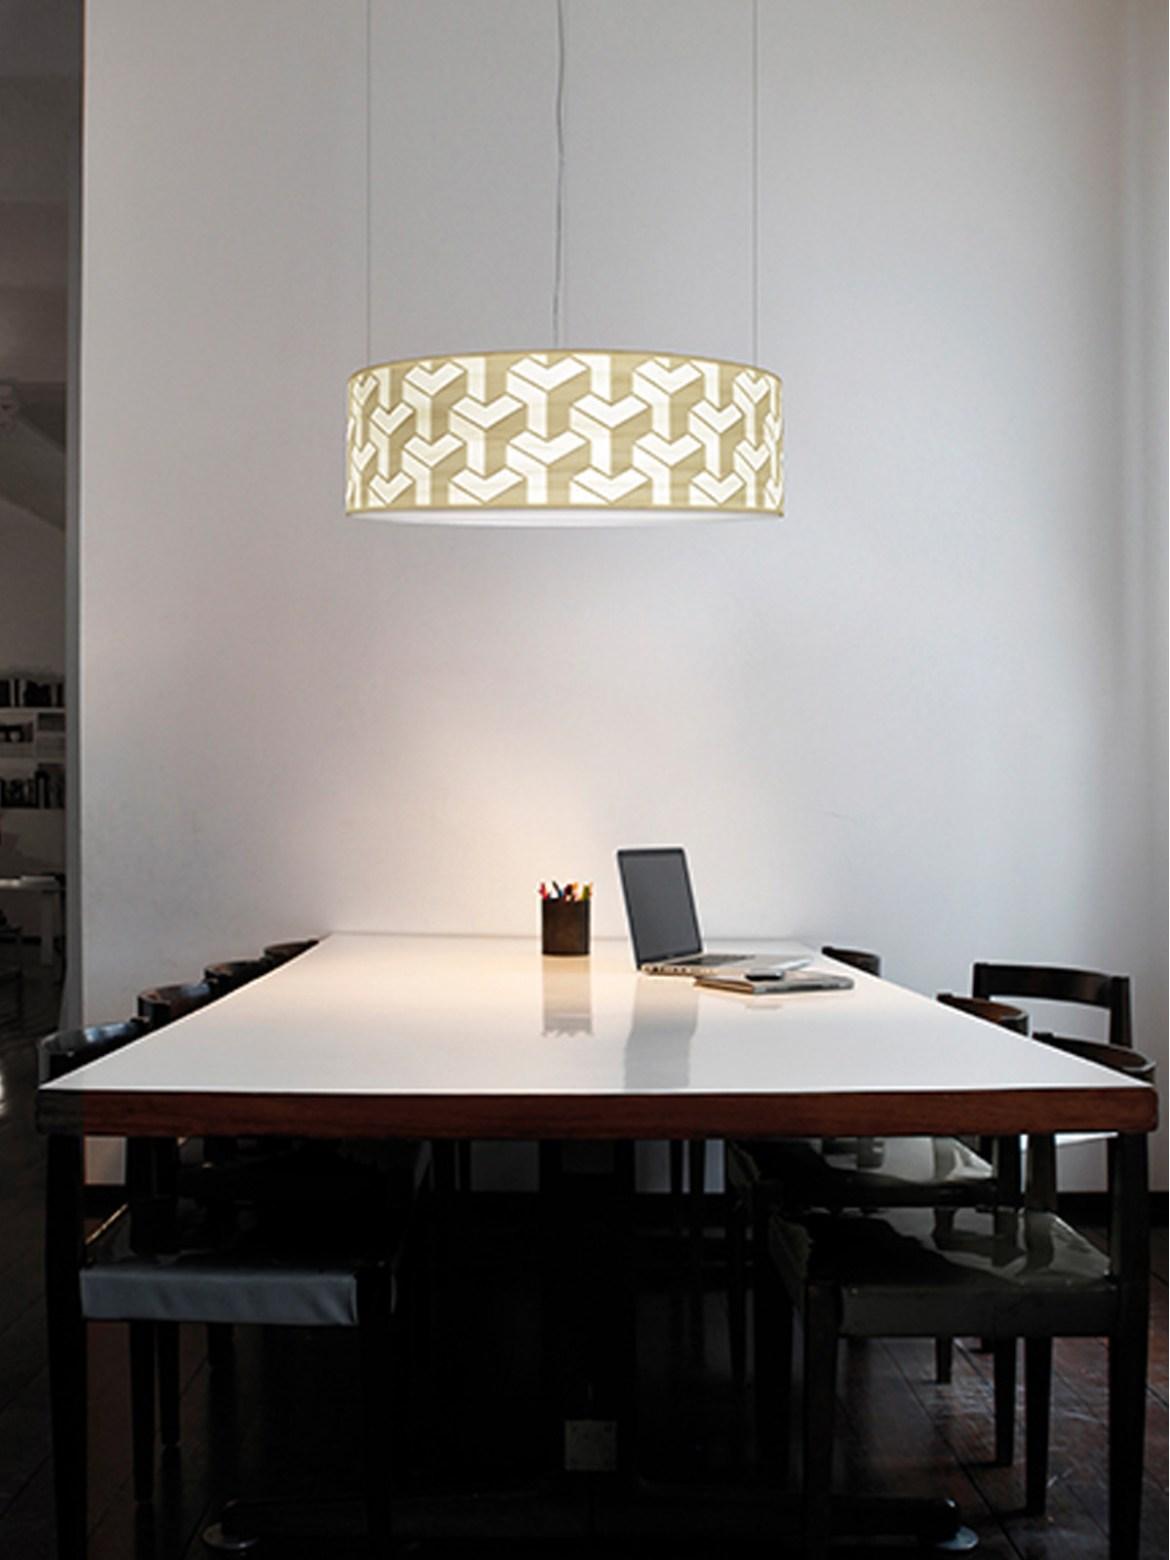 DesignOrt BLog: Neue Leuchten LZF Lamps Hide and Seek Pendelleuchte LZF